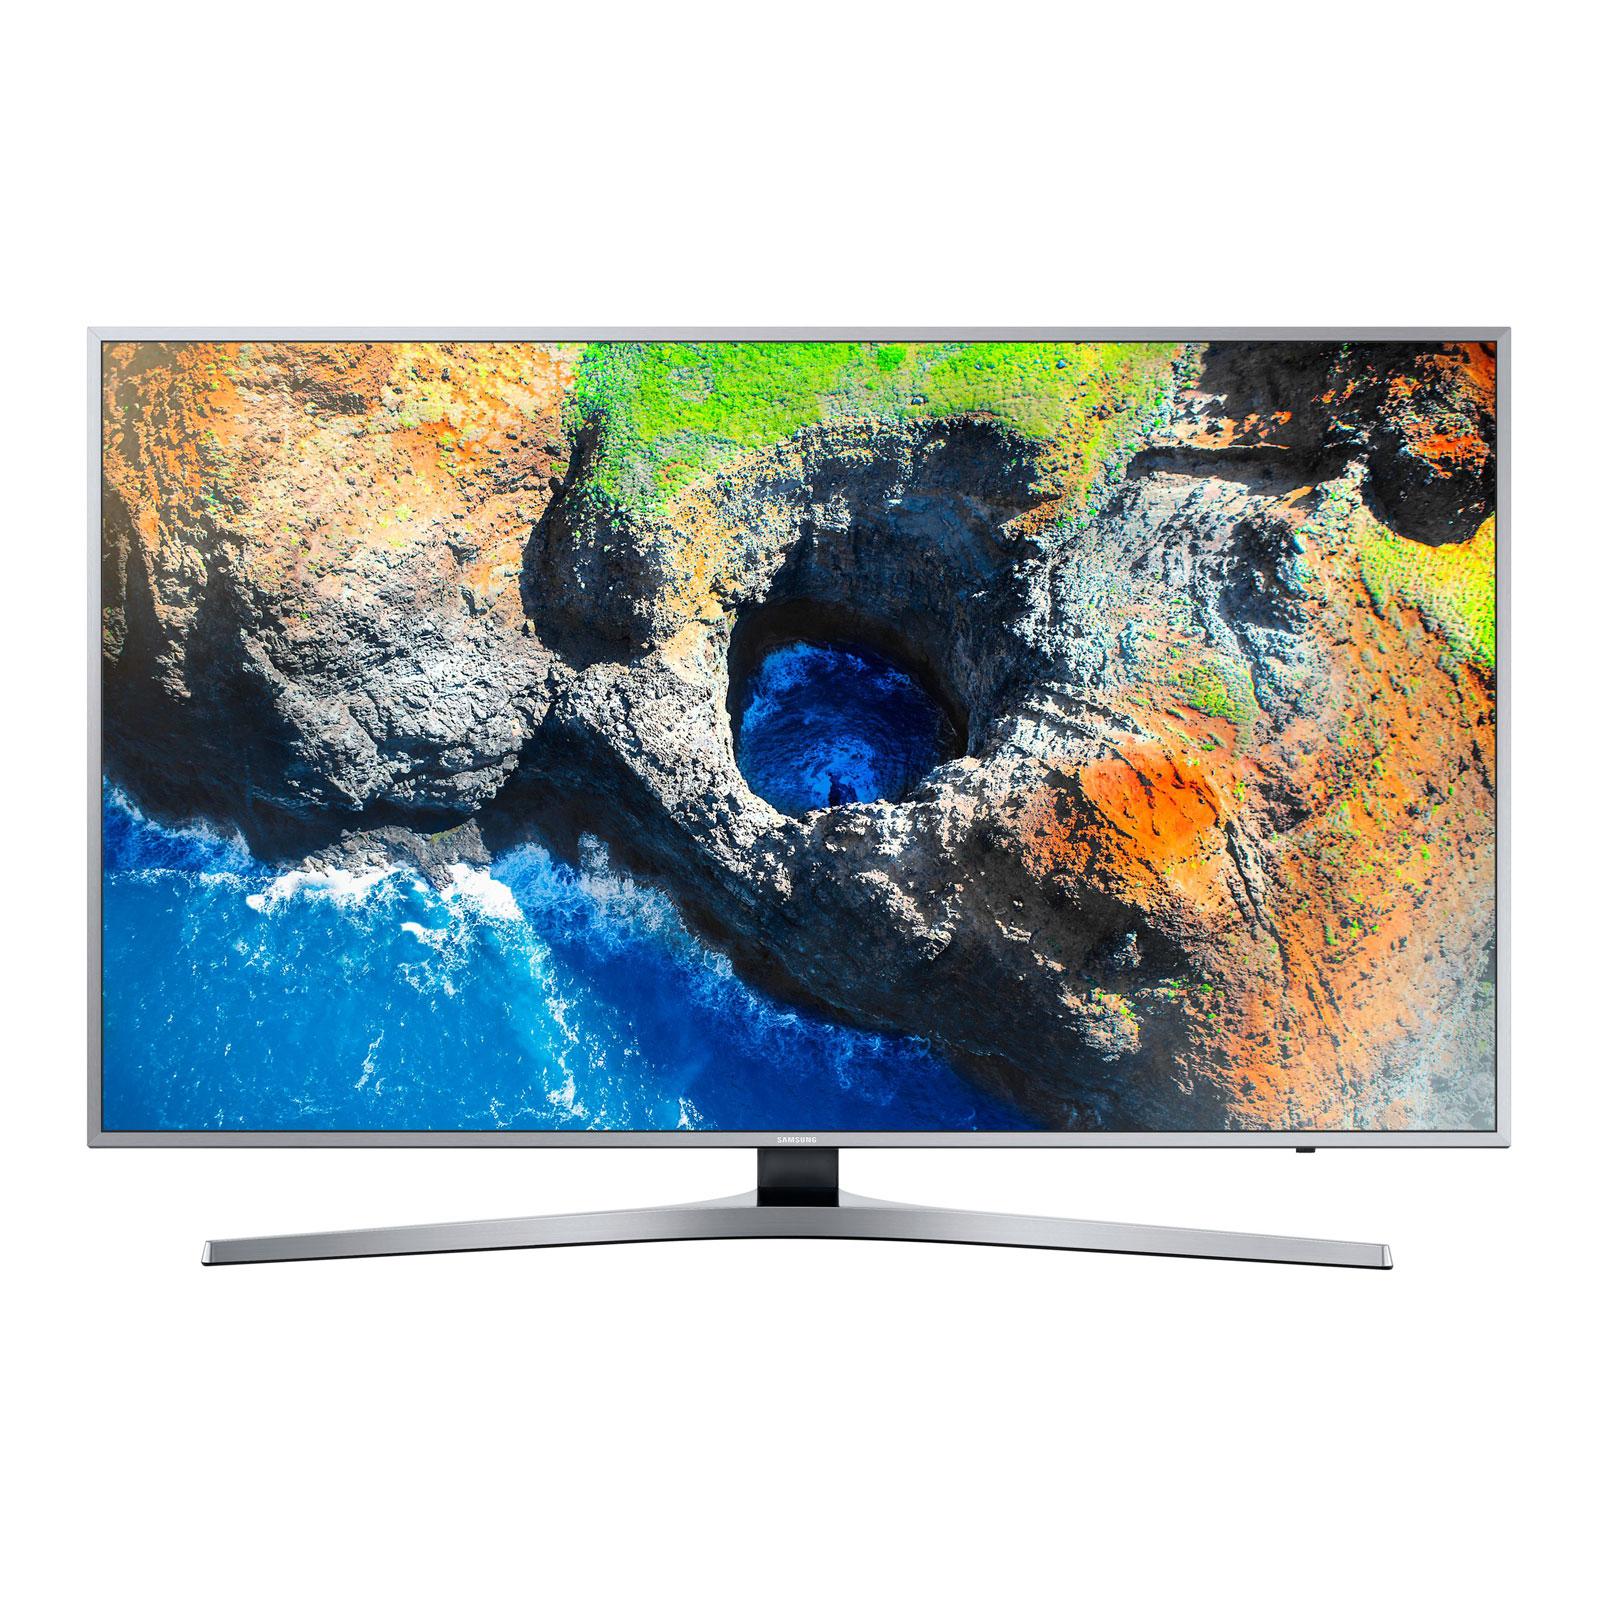 "TV 55"" Samsung UE55MU6405 - 4K UHD, LED, HDR, 1500 PQI, smart TV"